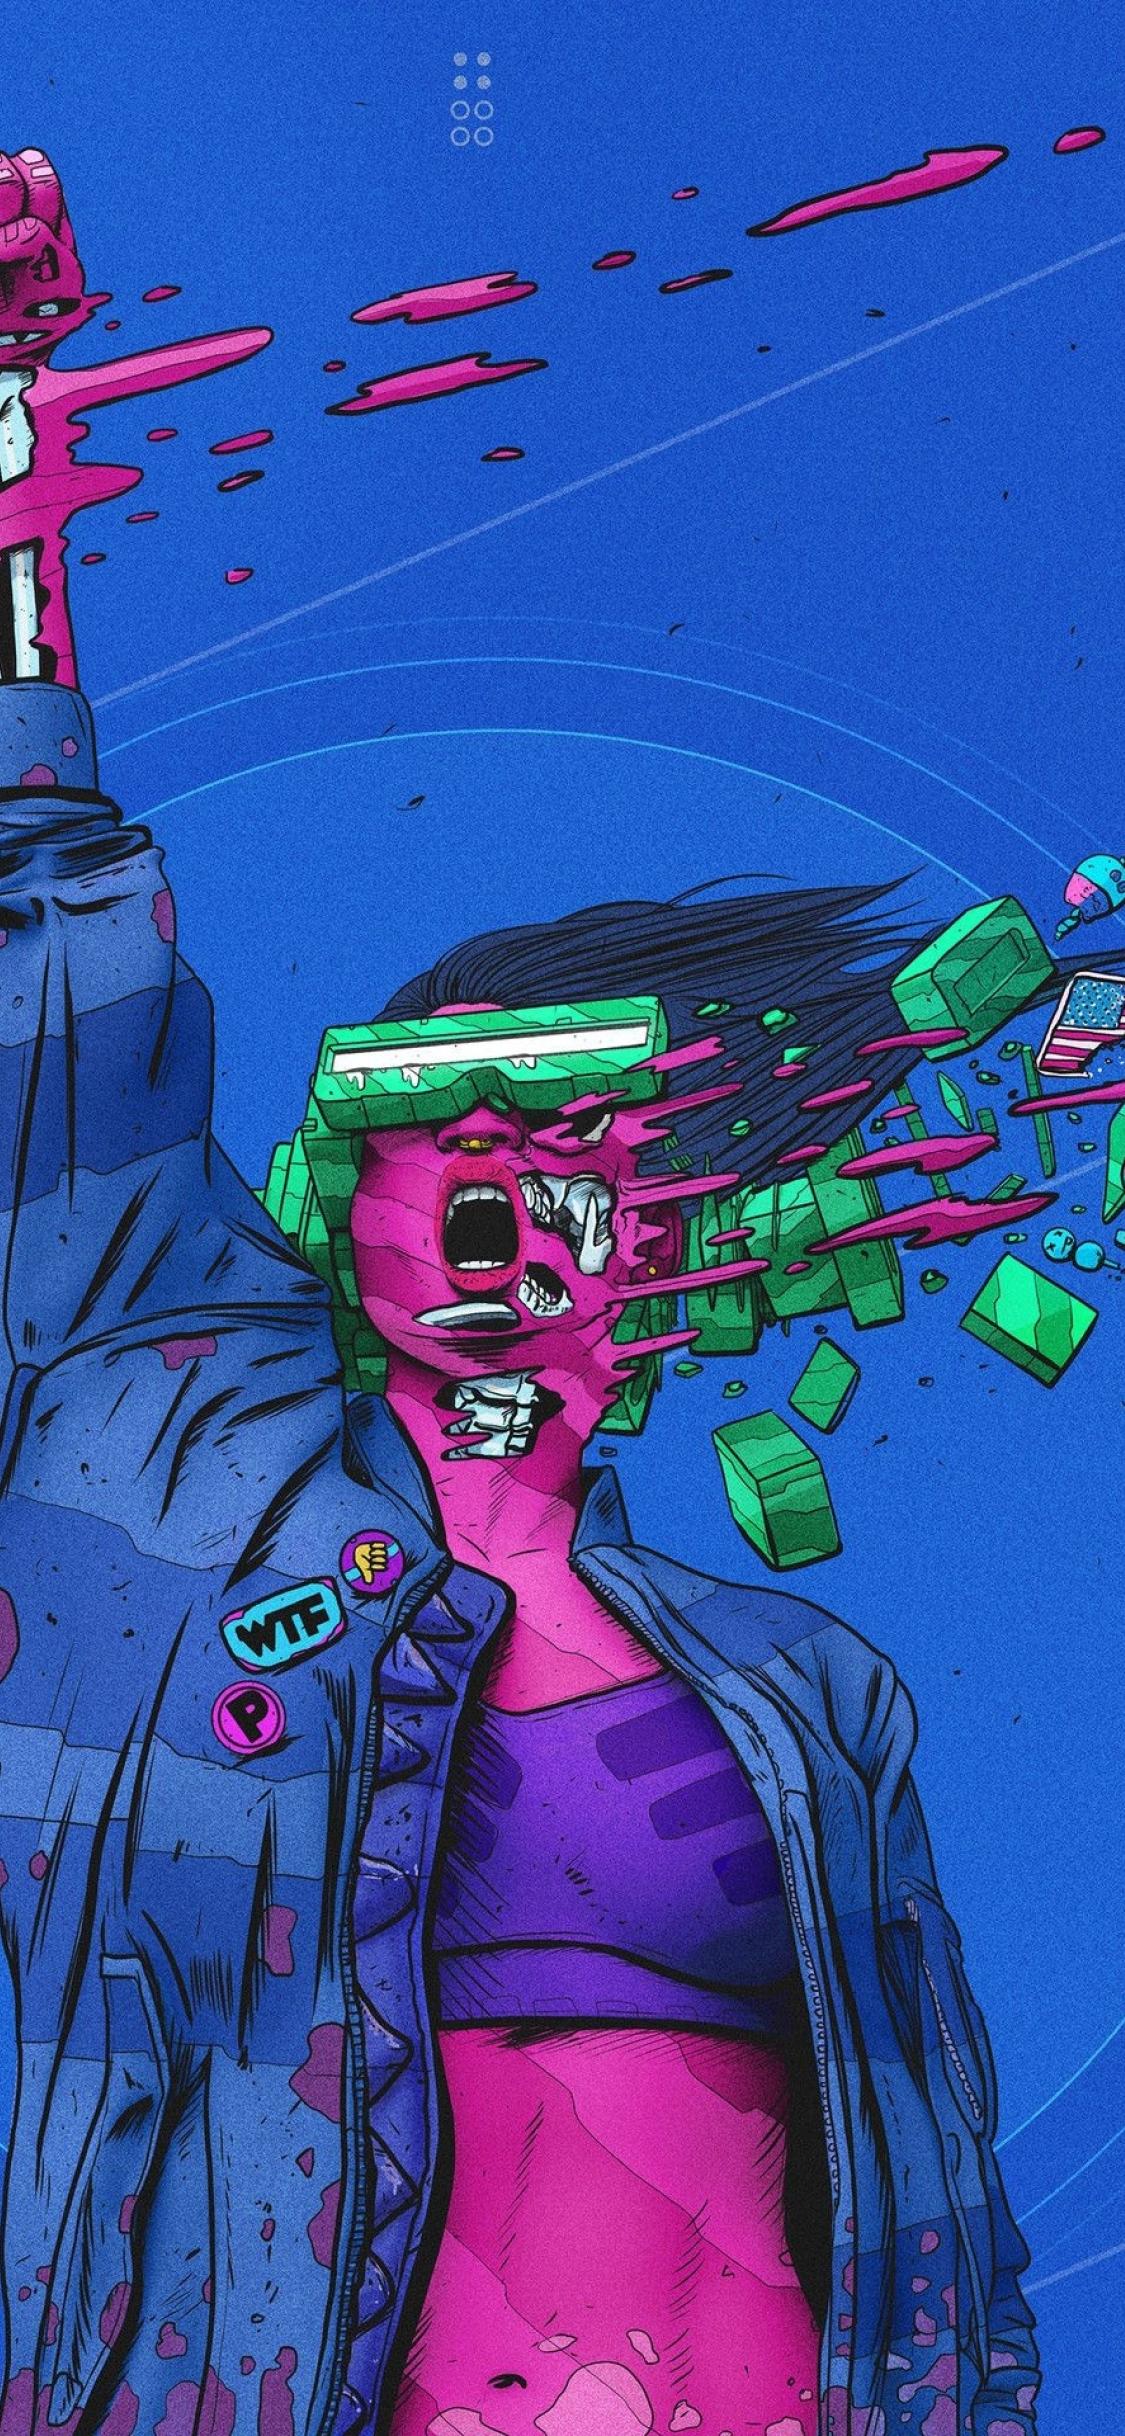 1125x2436 Surreal Cyberpunk Artwork Iphone Xs Iphone 10